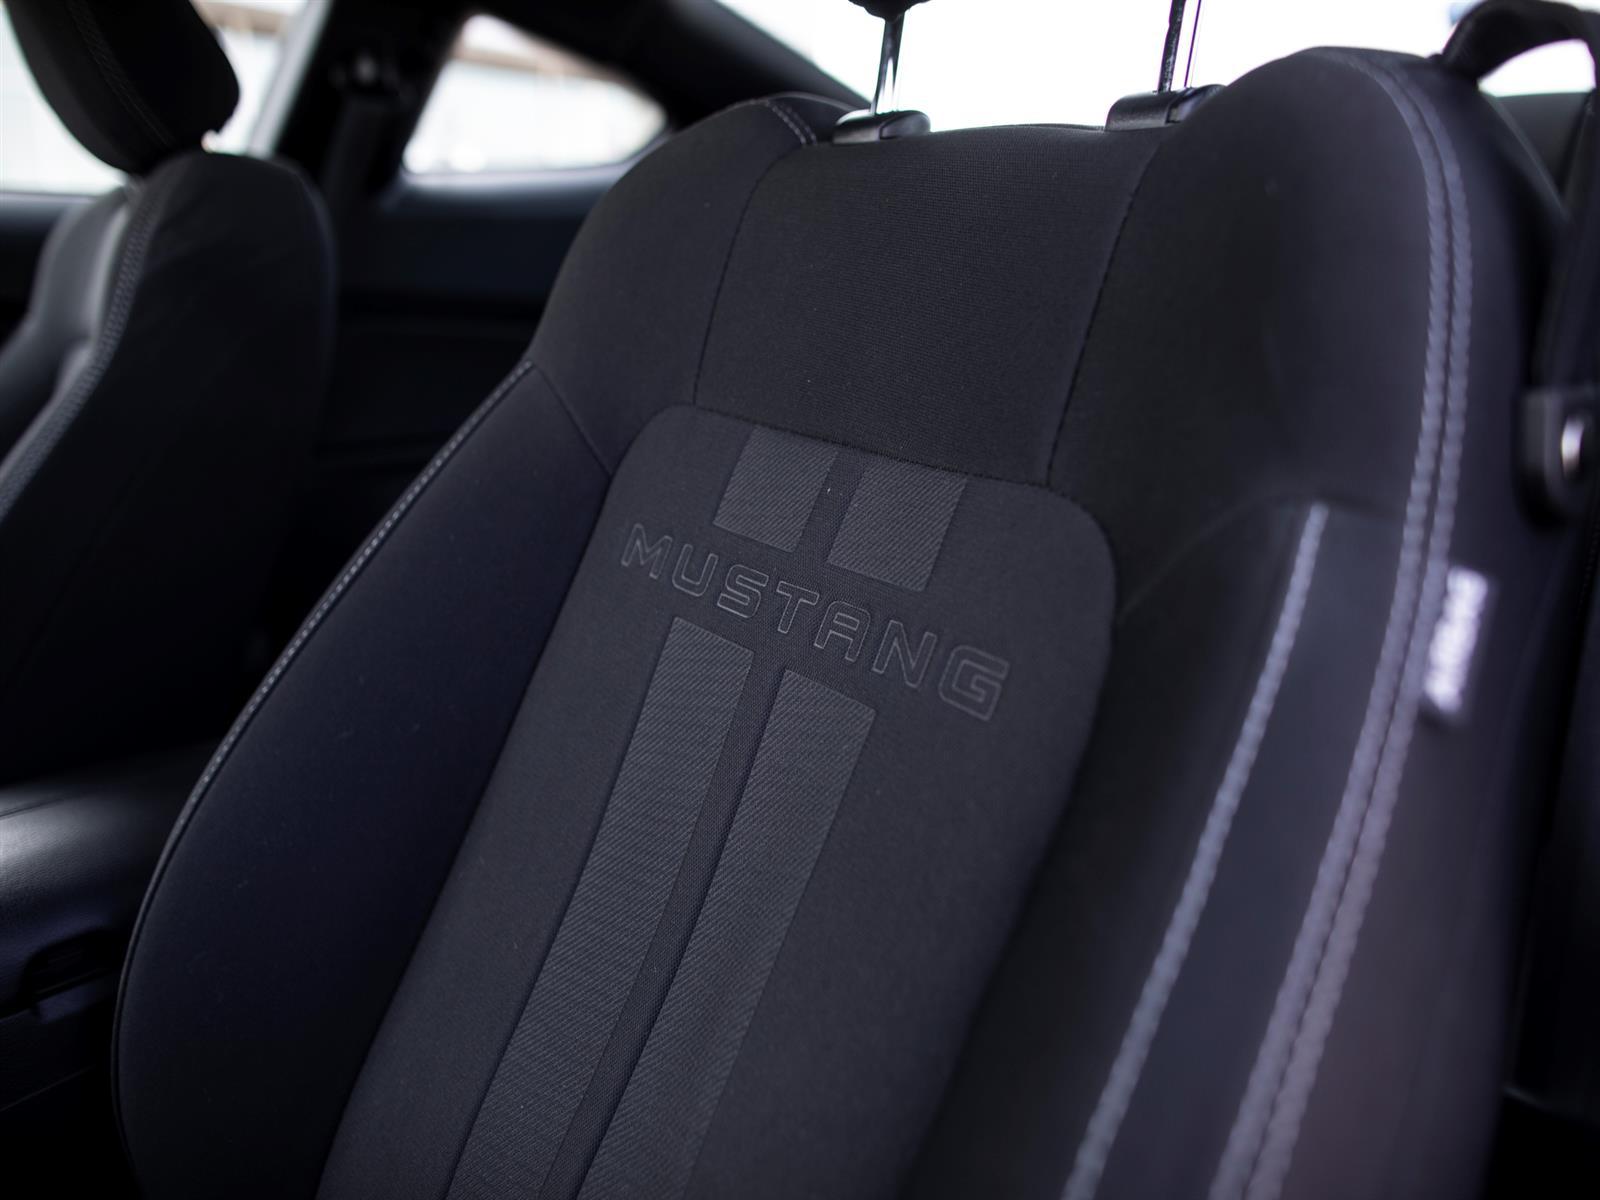 2018 Ford Mustang GT Prem